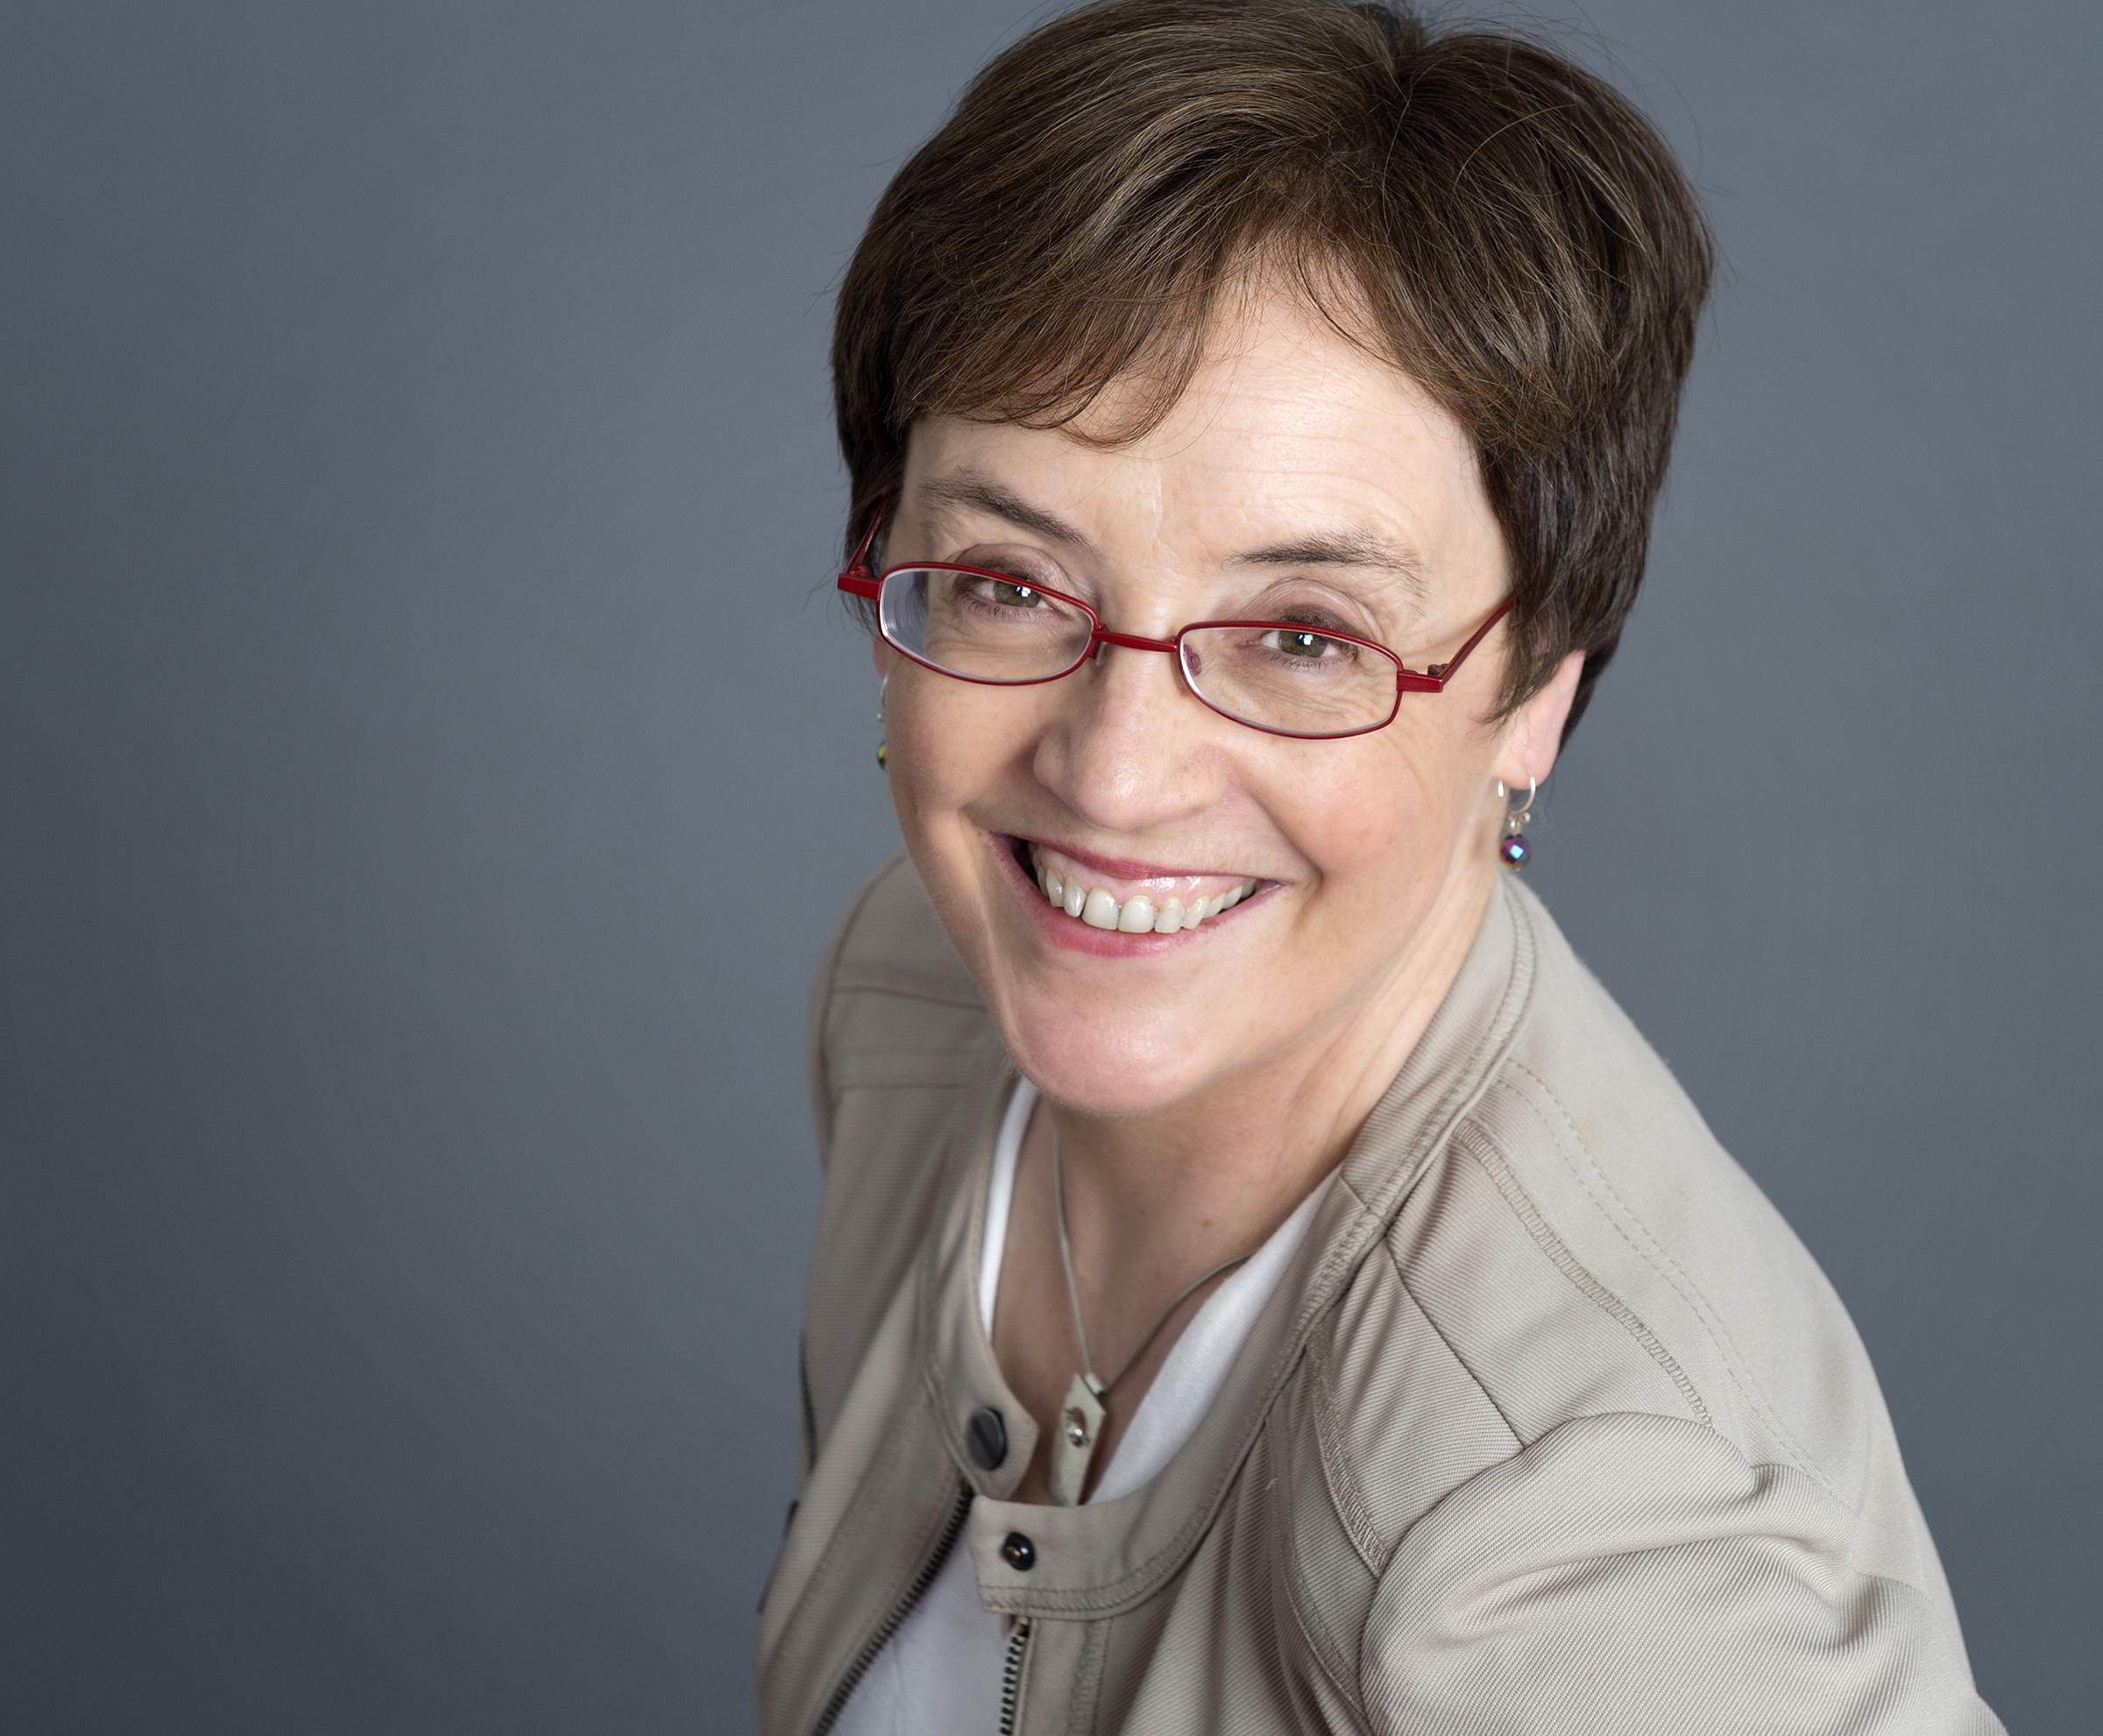 Aileen O'Meara Media Ltd